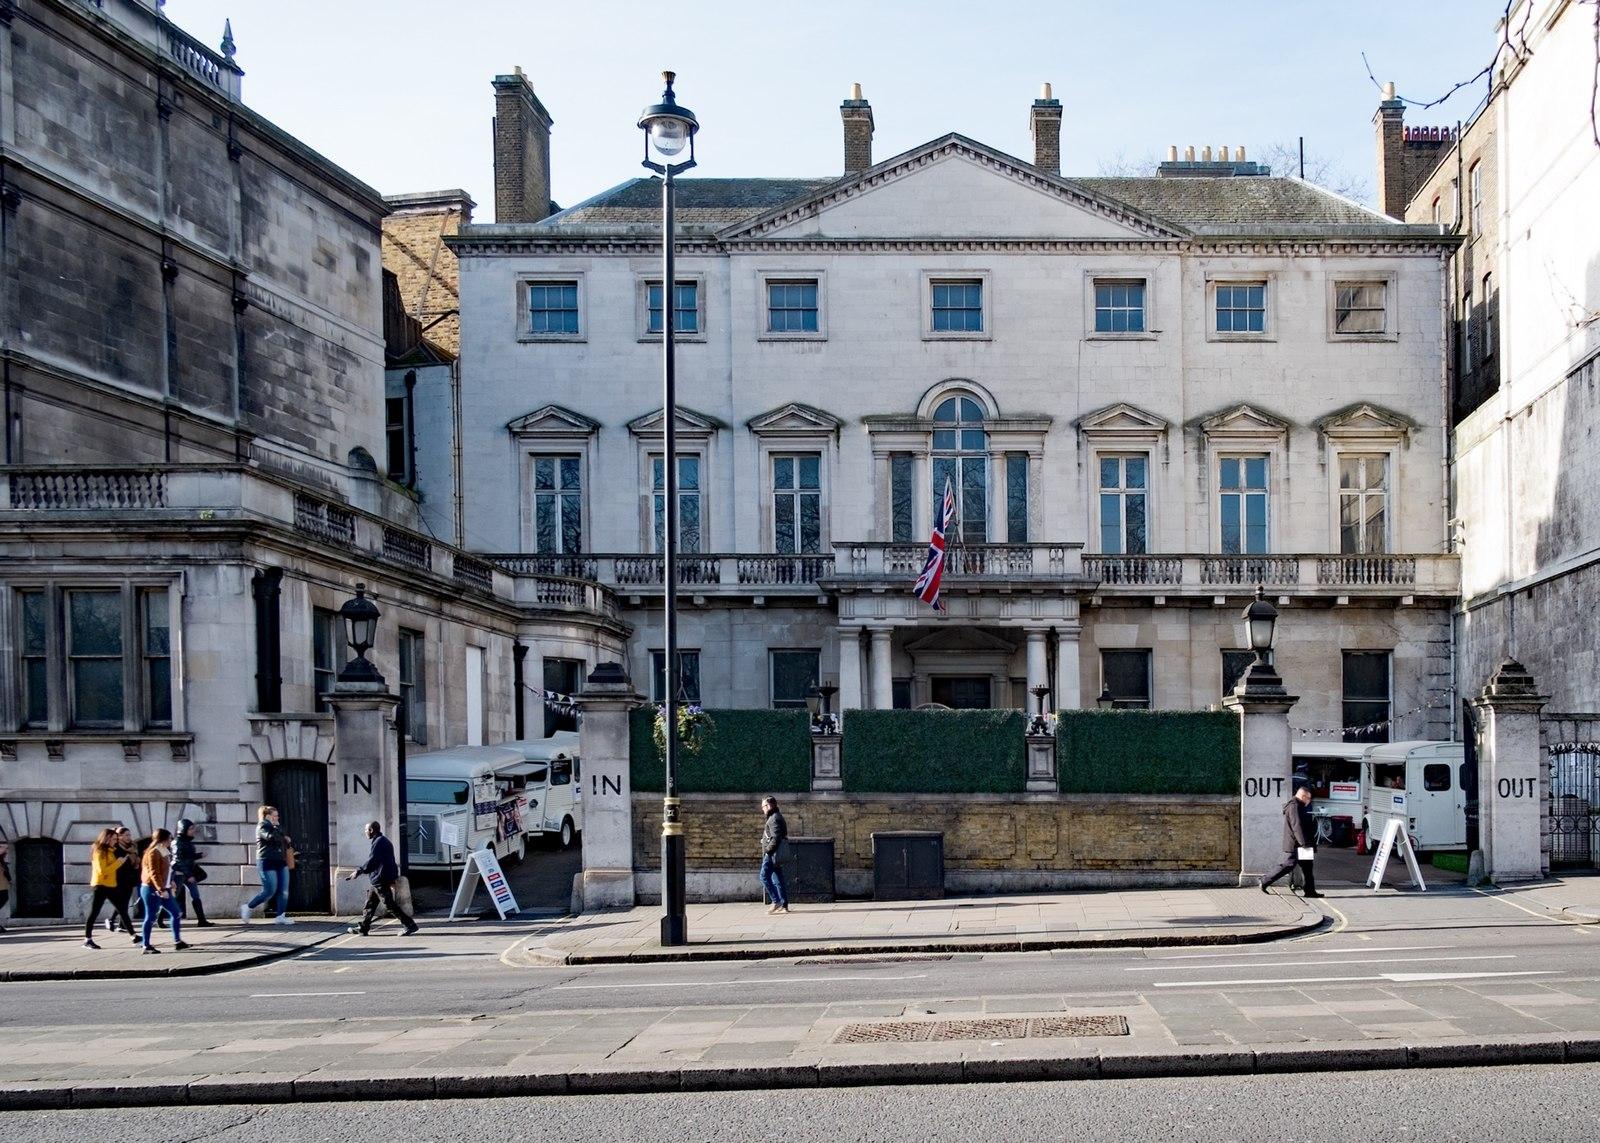 Cambridge House - Wikipedia